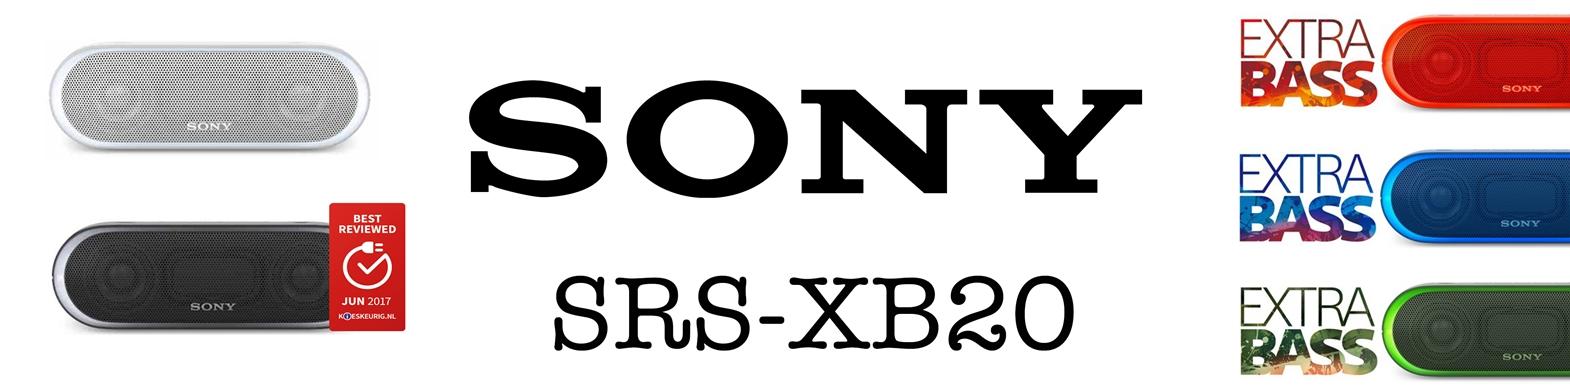 SRS-XB20